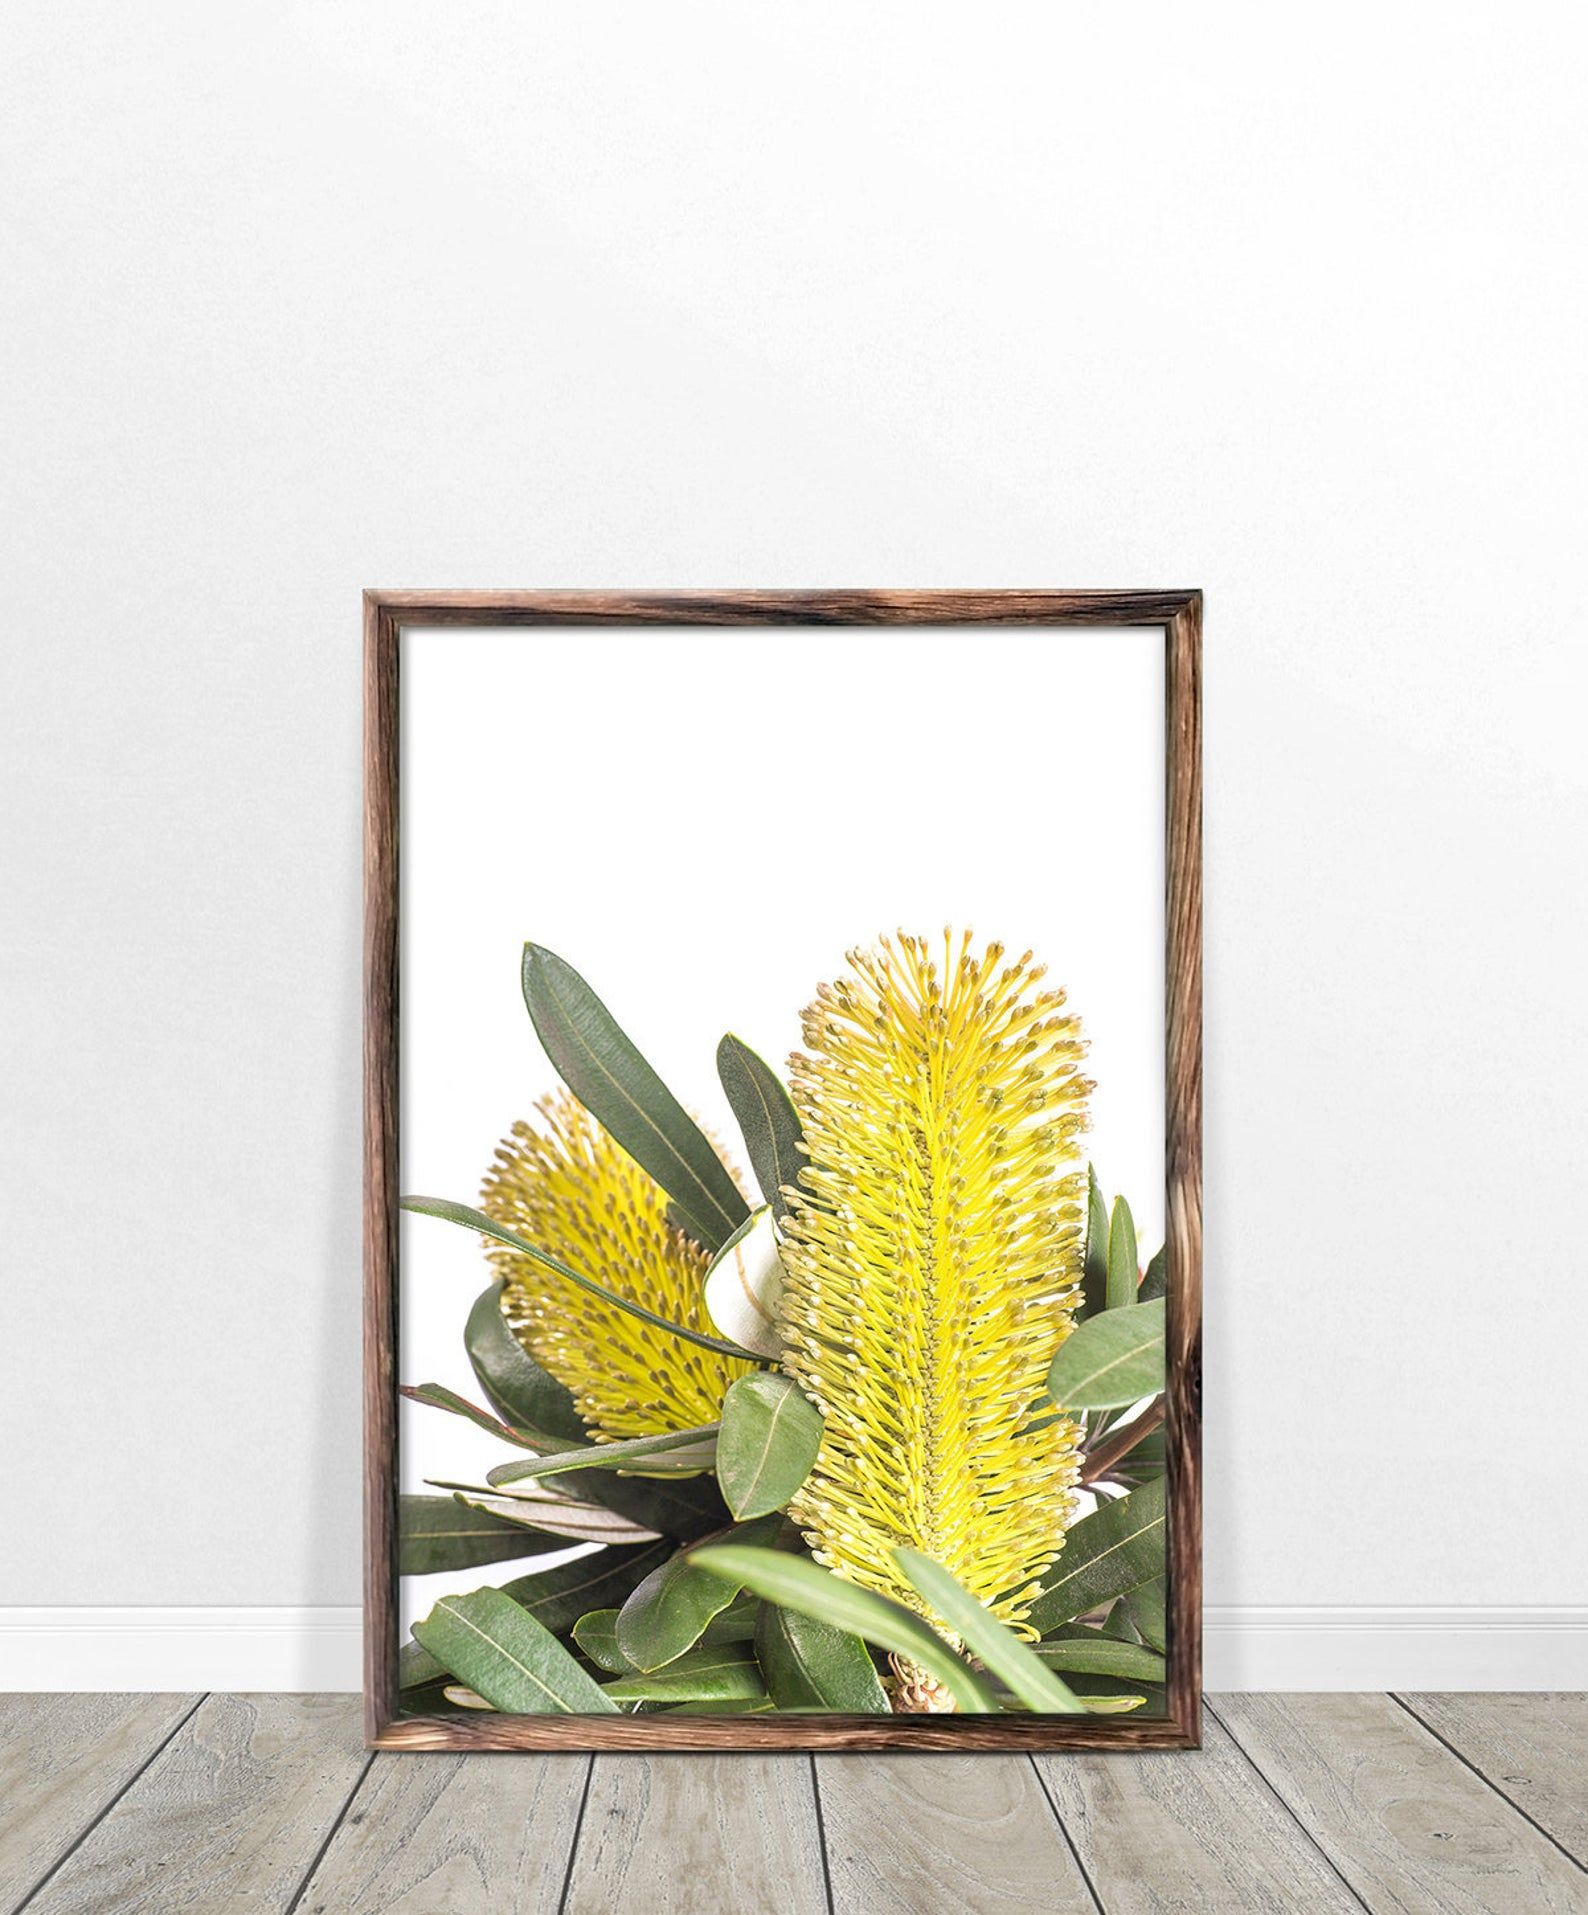 Banksia Print Digital Download Australian Native Photography Flower Wall Art Yellow Flower Print Australian Flowers Botanical Native Print In 2020 Flower Wall Art Flower Art Yellow Flower Print